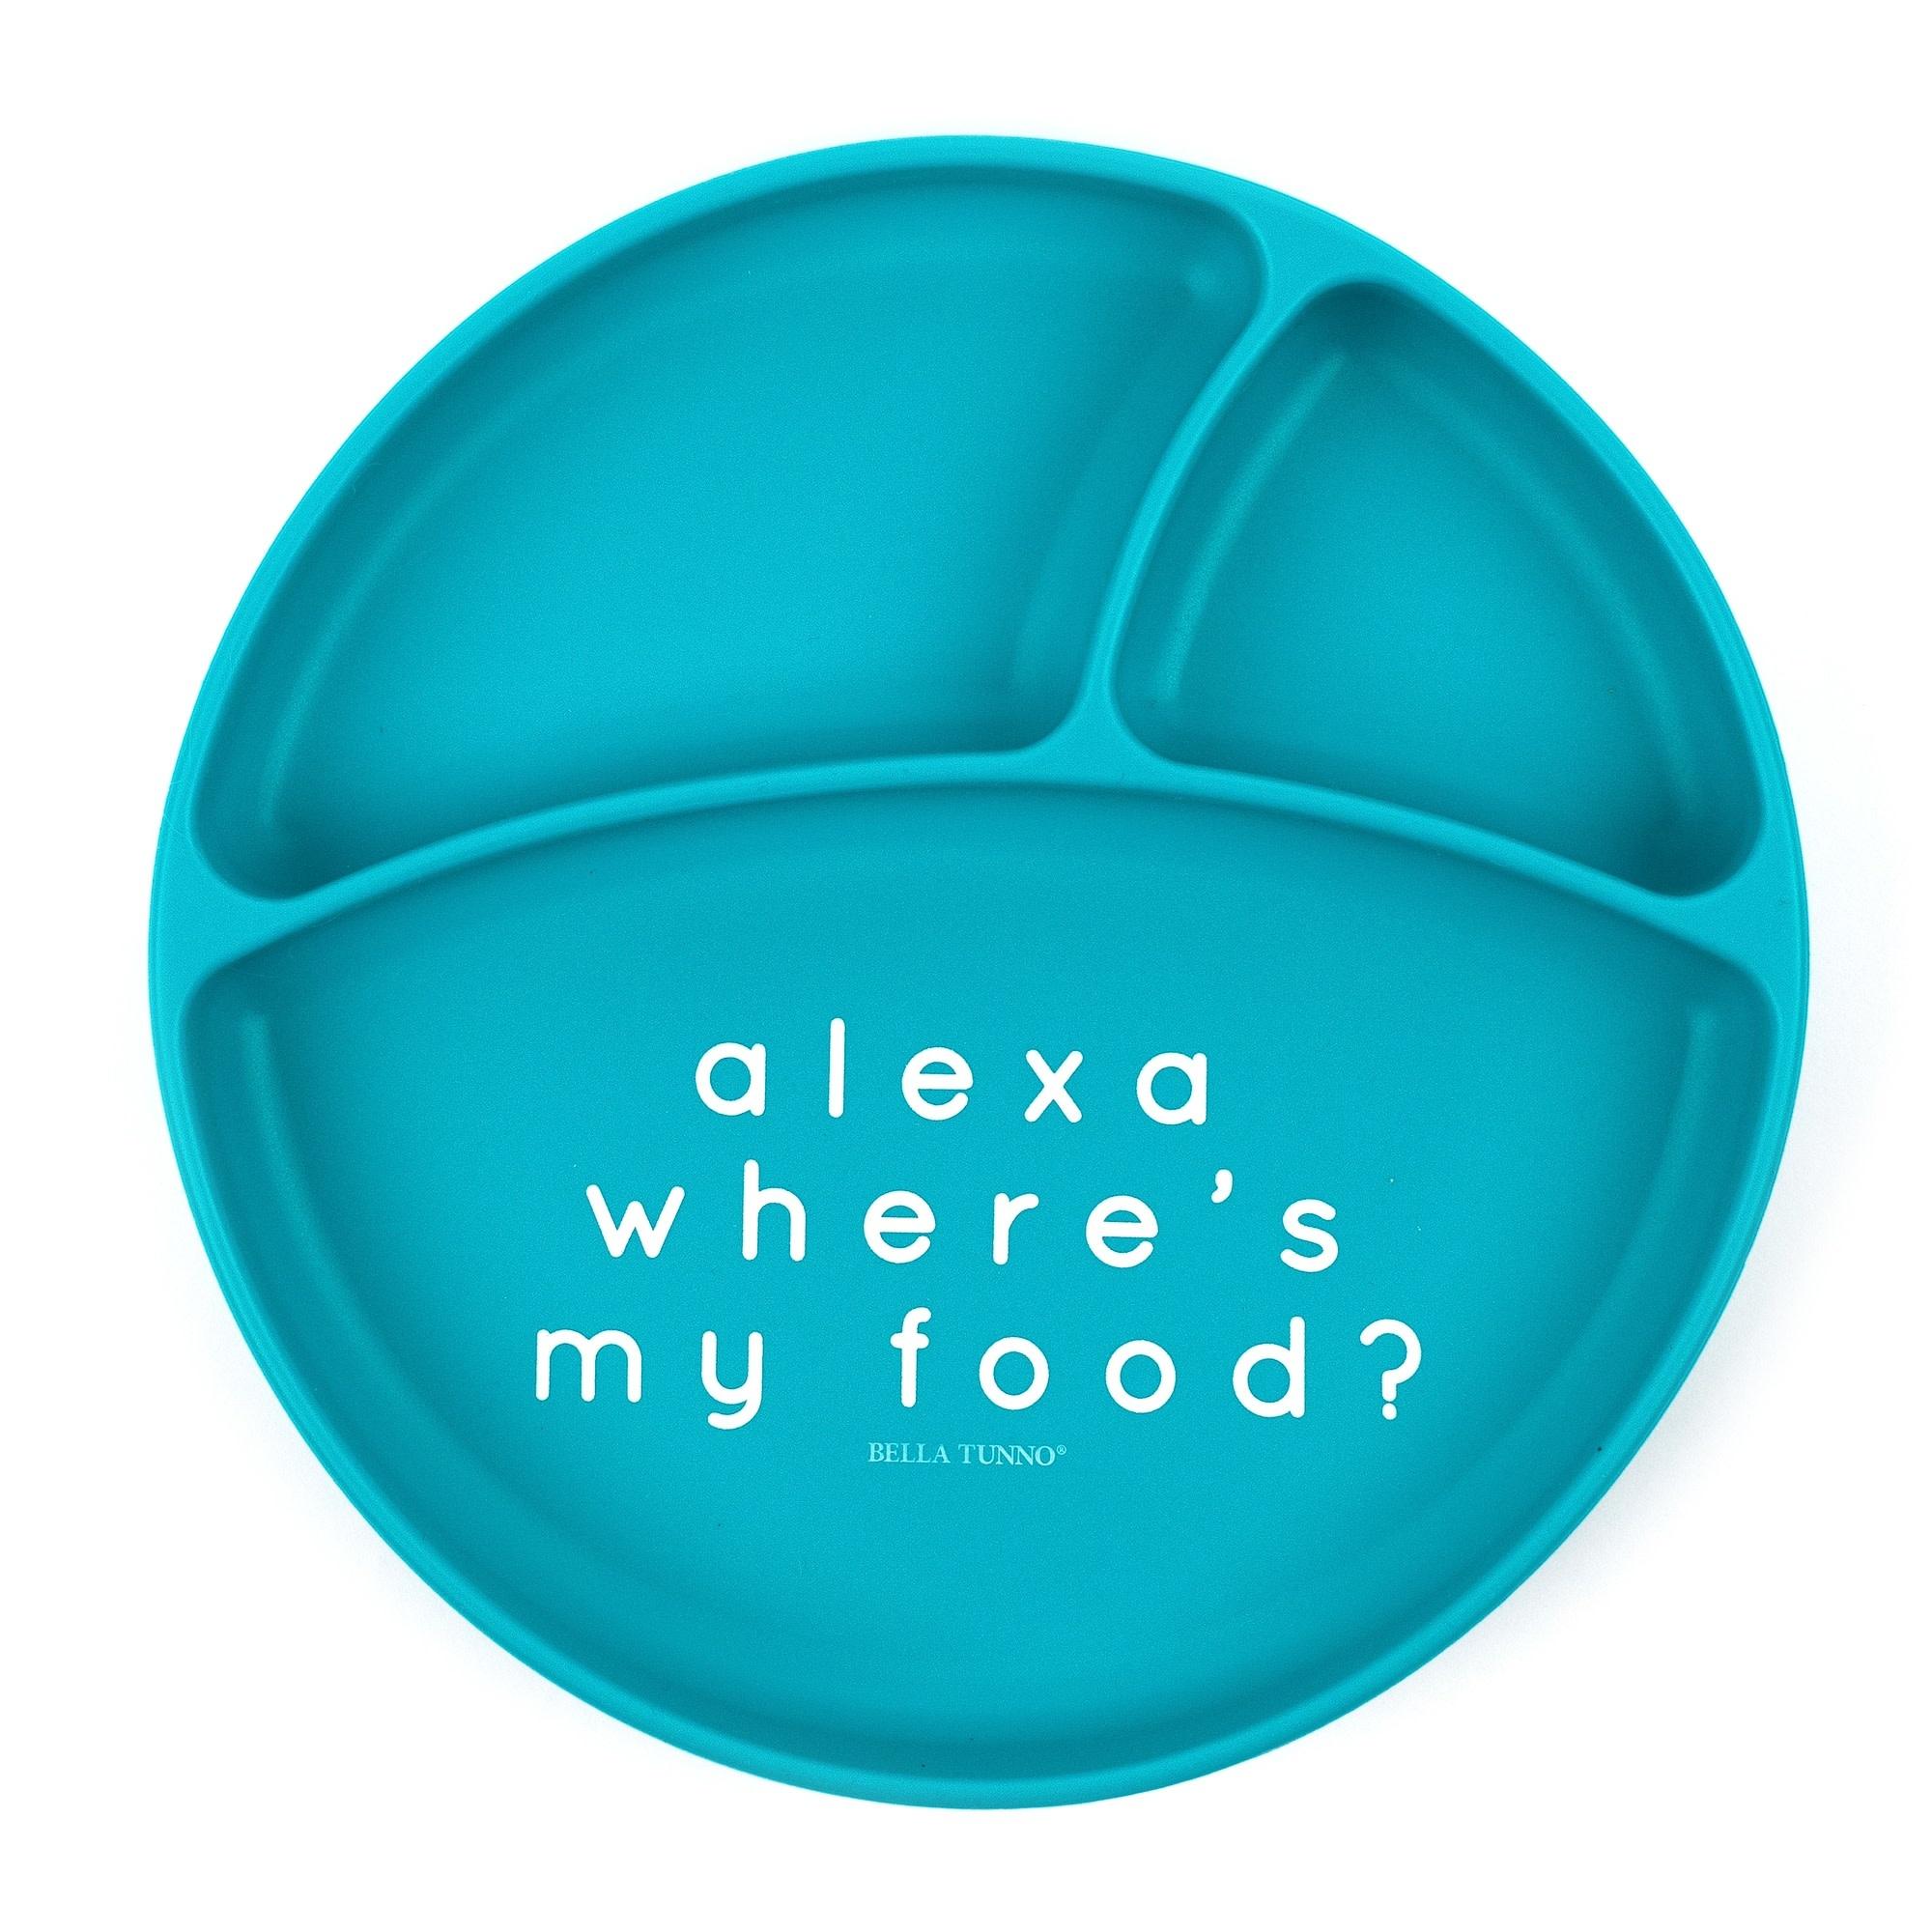 Alexa Wheres My Food Wonder Plate-1